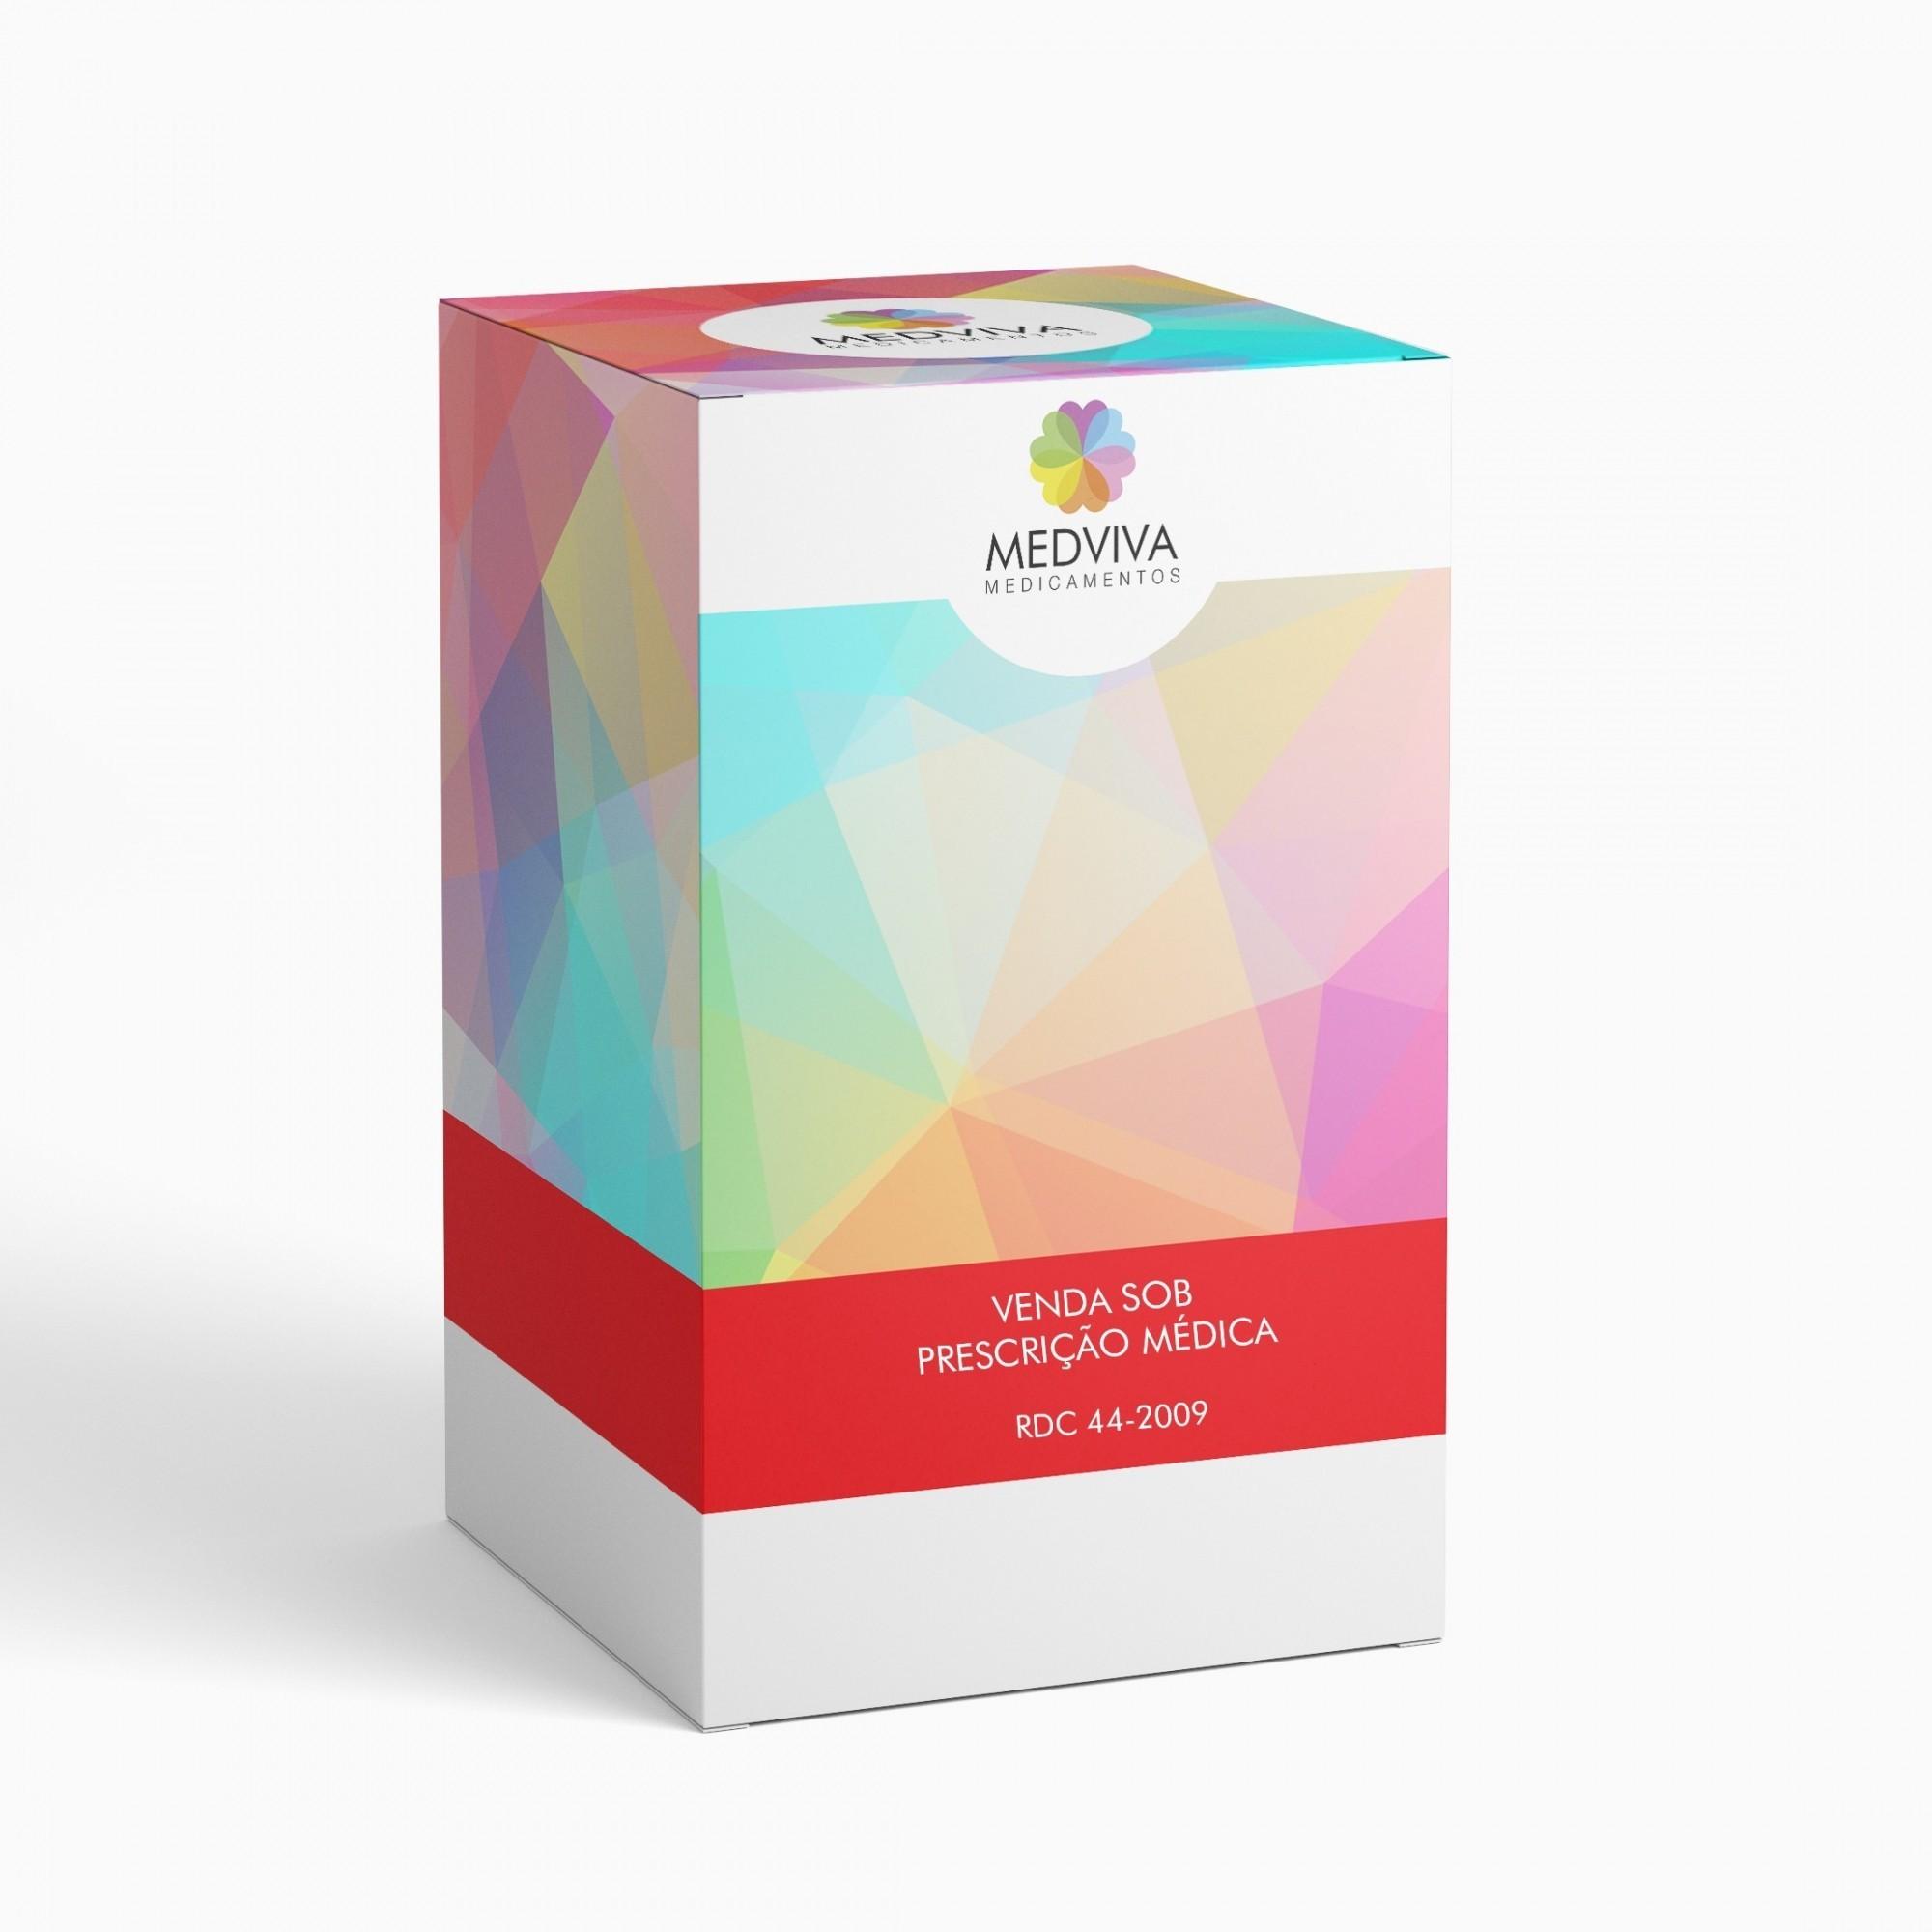 Besilato De Anlodipino 10mg 30 Comprimidos Sandoz